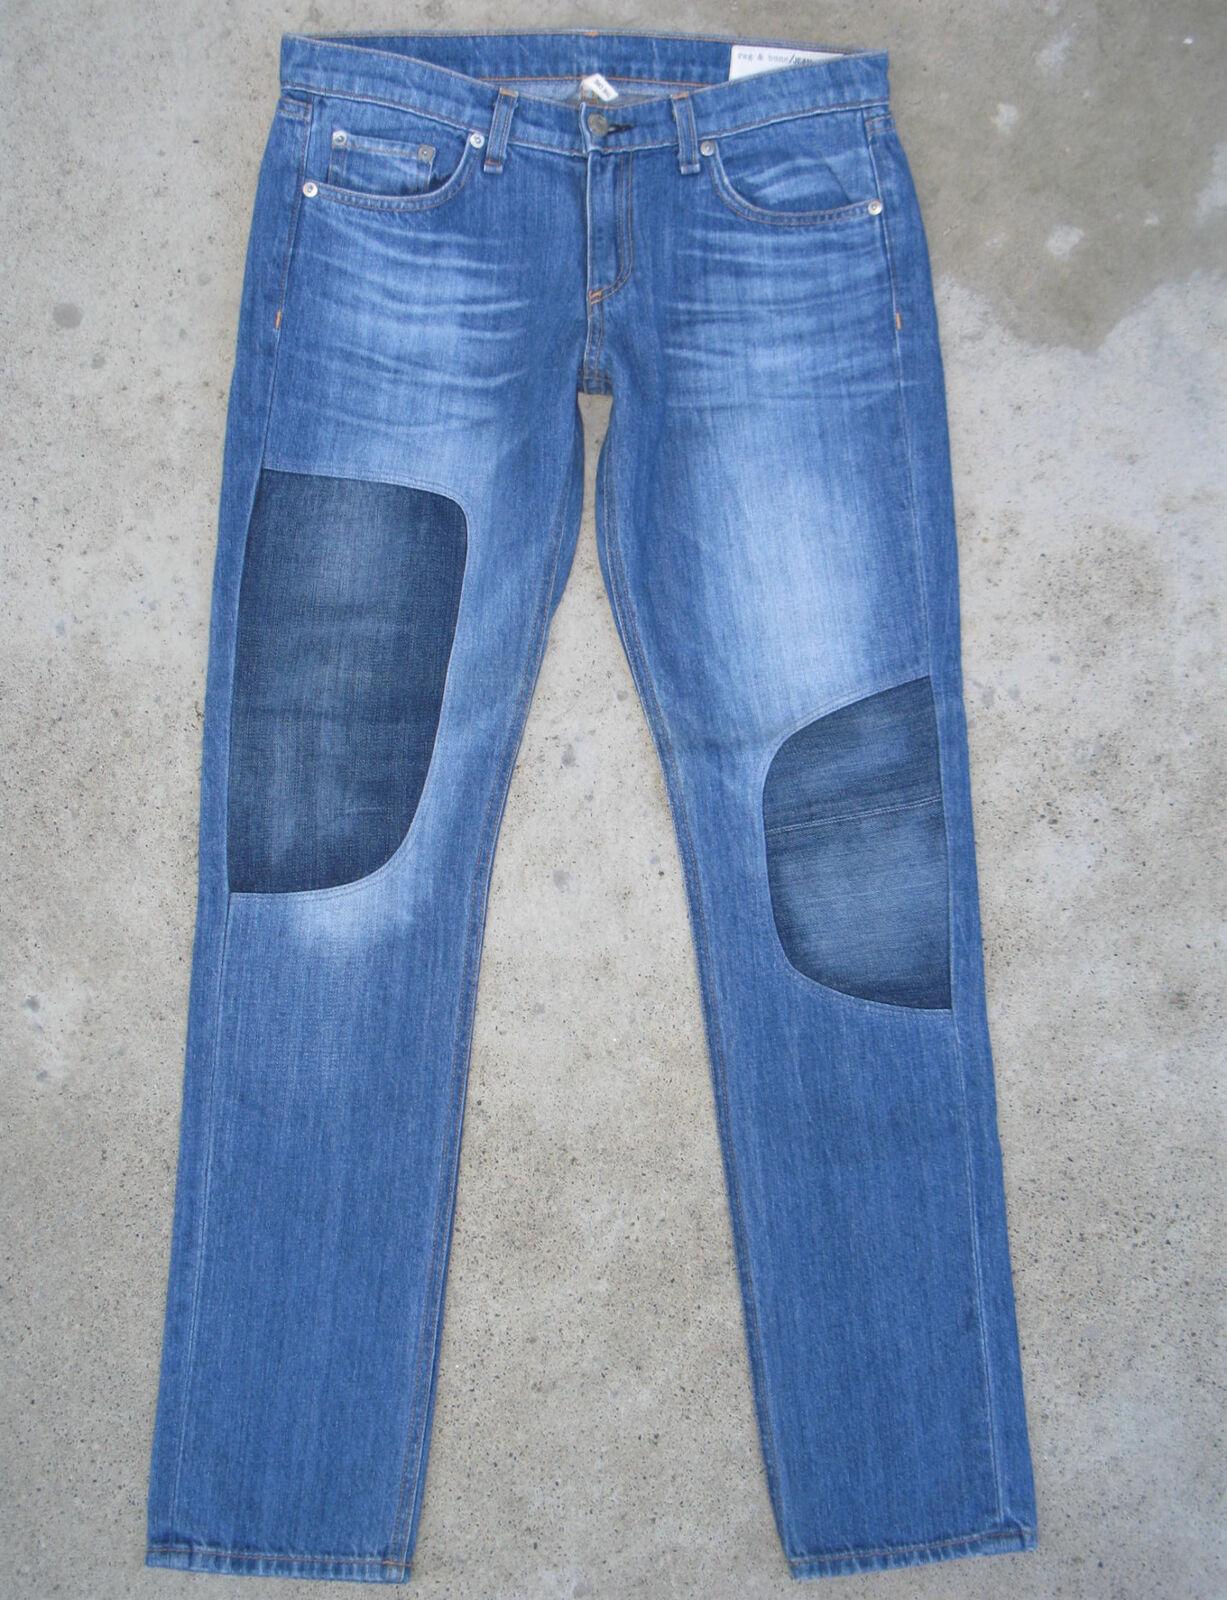 Rag & bone Womens Dre Jeans Sz 28 Mid Skinny Distressed 100% Cotton w Patches